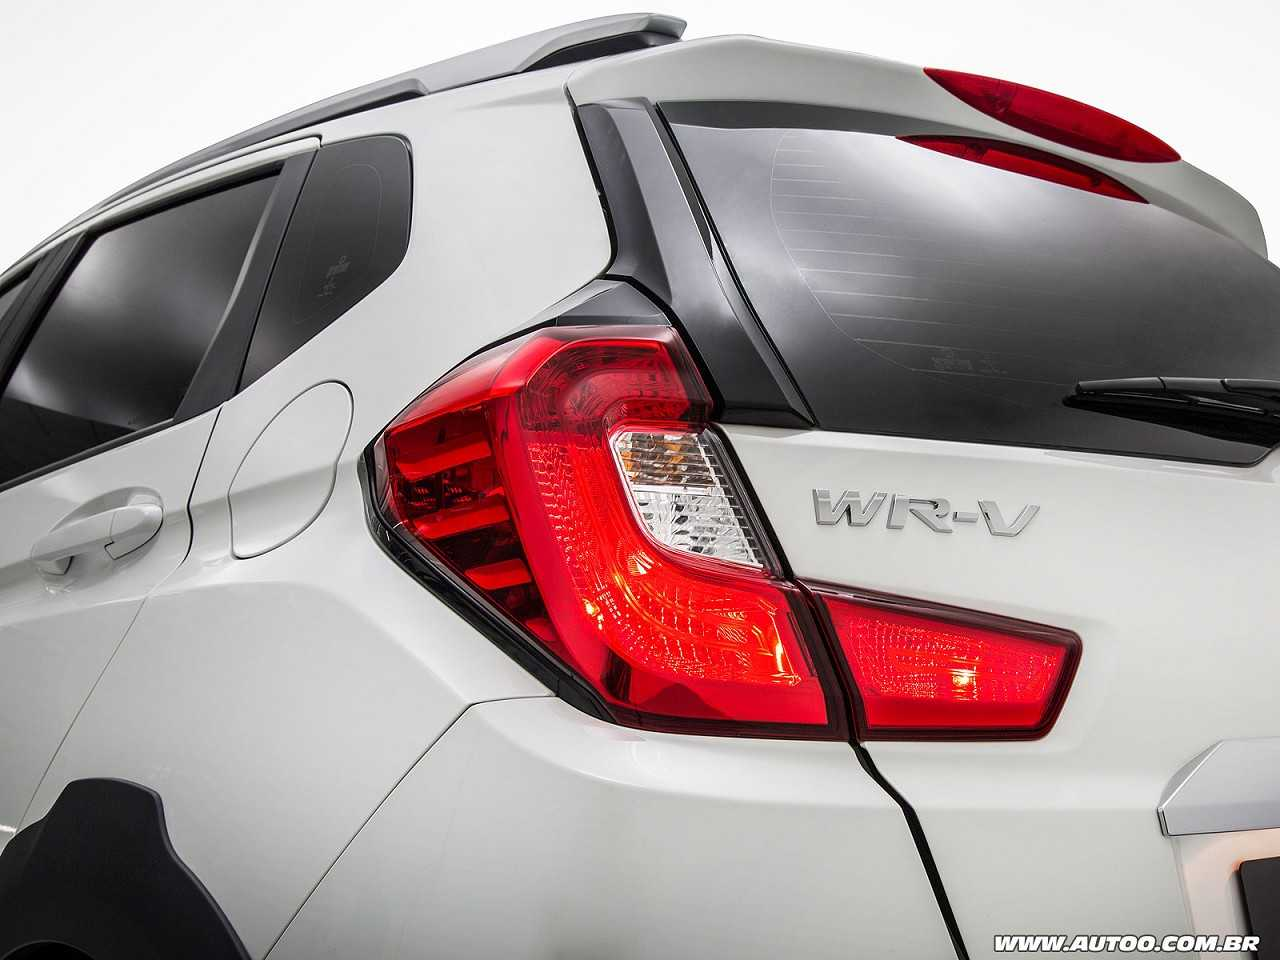 HondaWR-V 2017 - lanternas